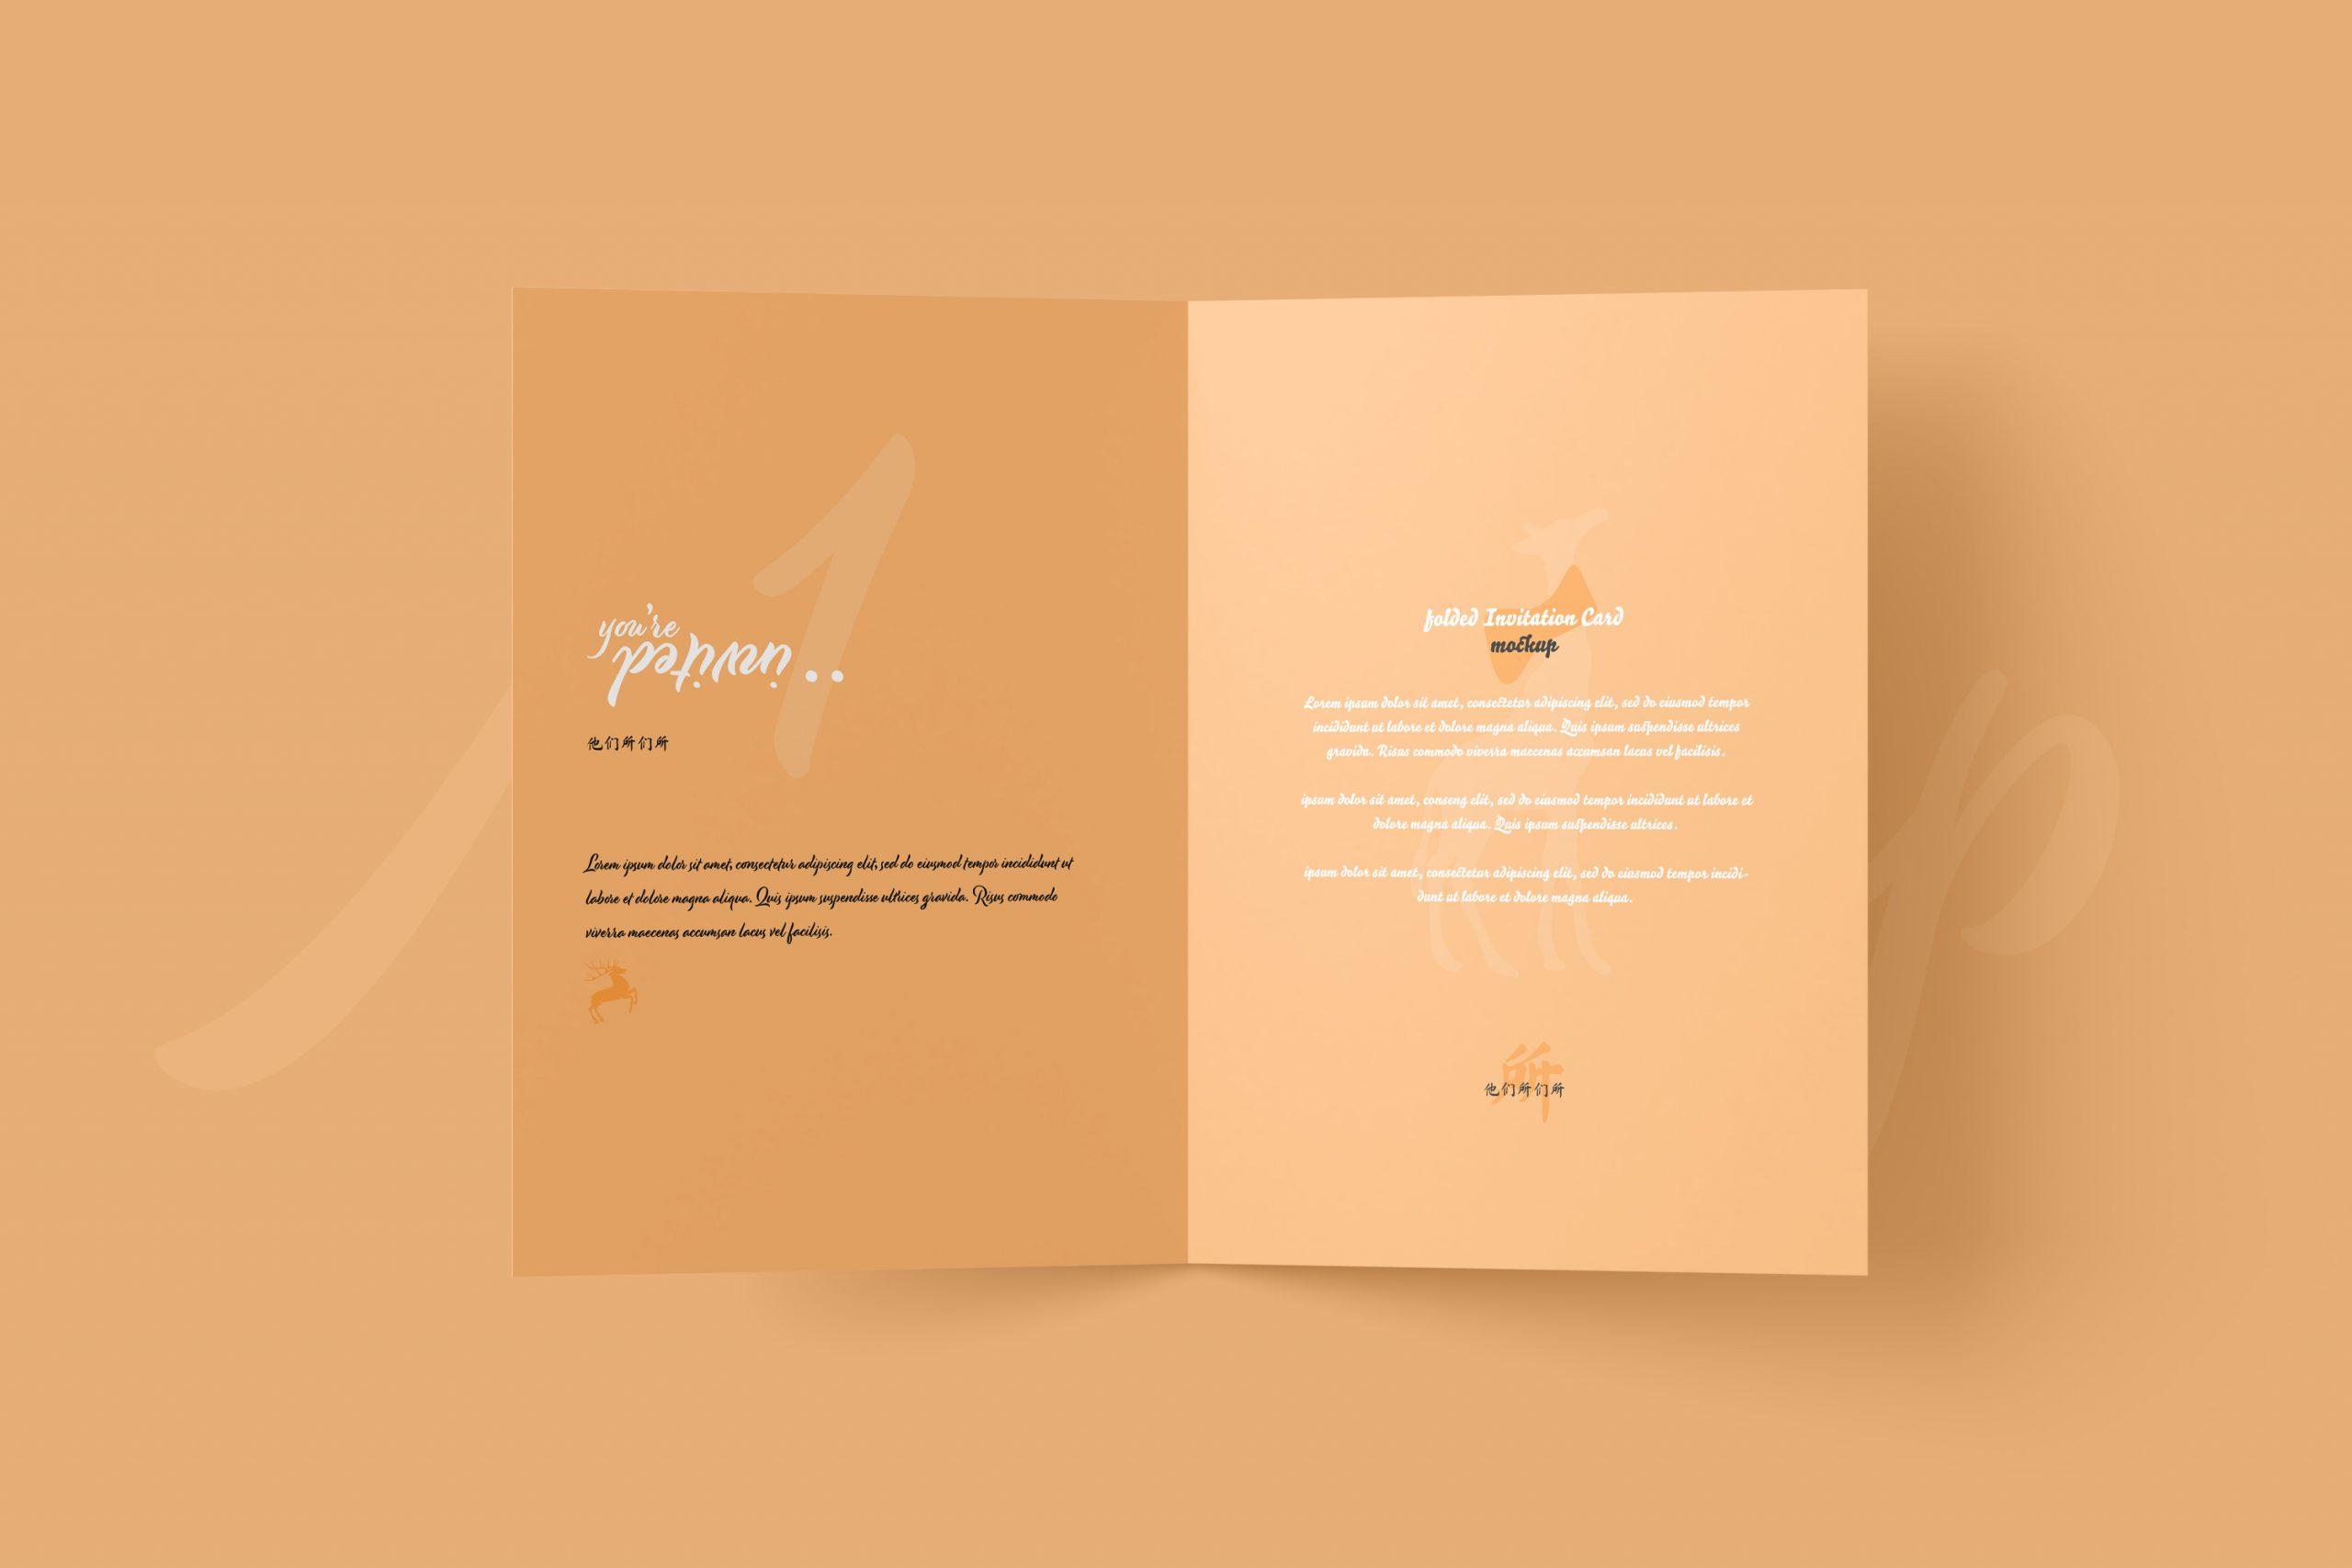 Invitation Card Mockup With Envelope